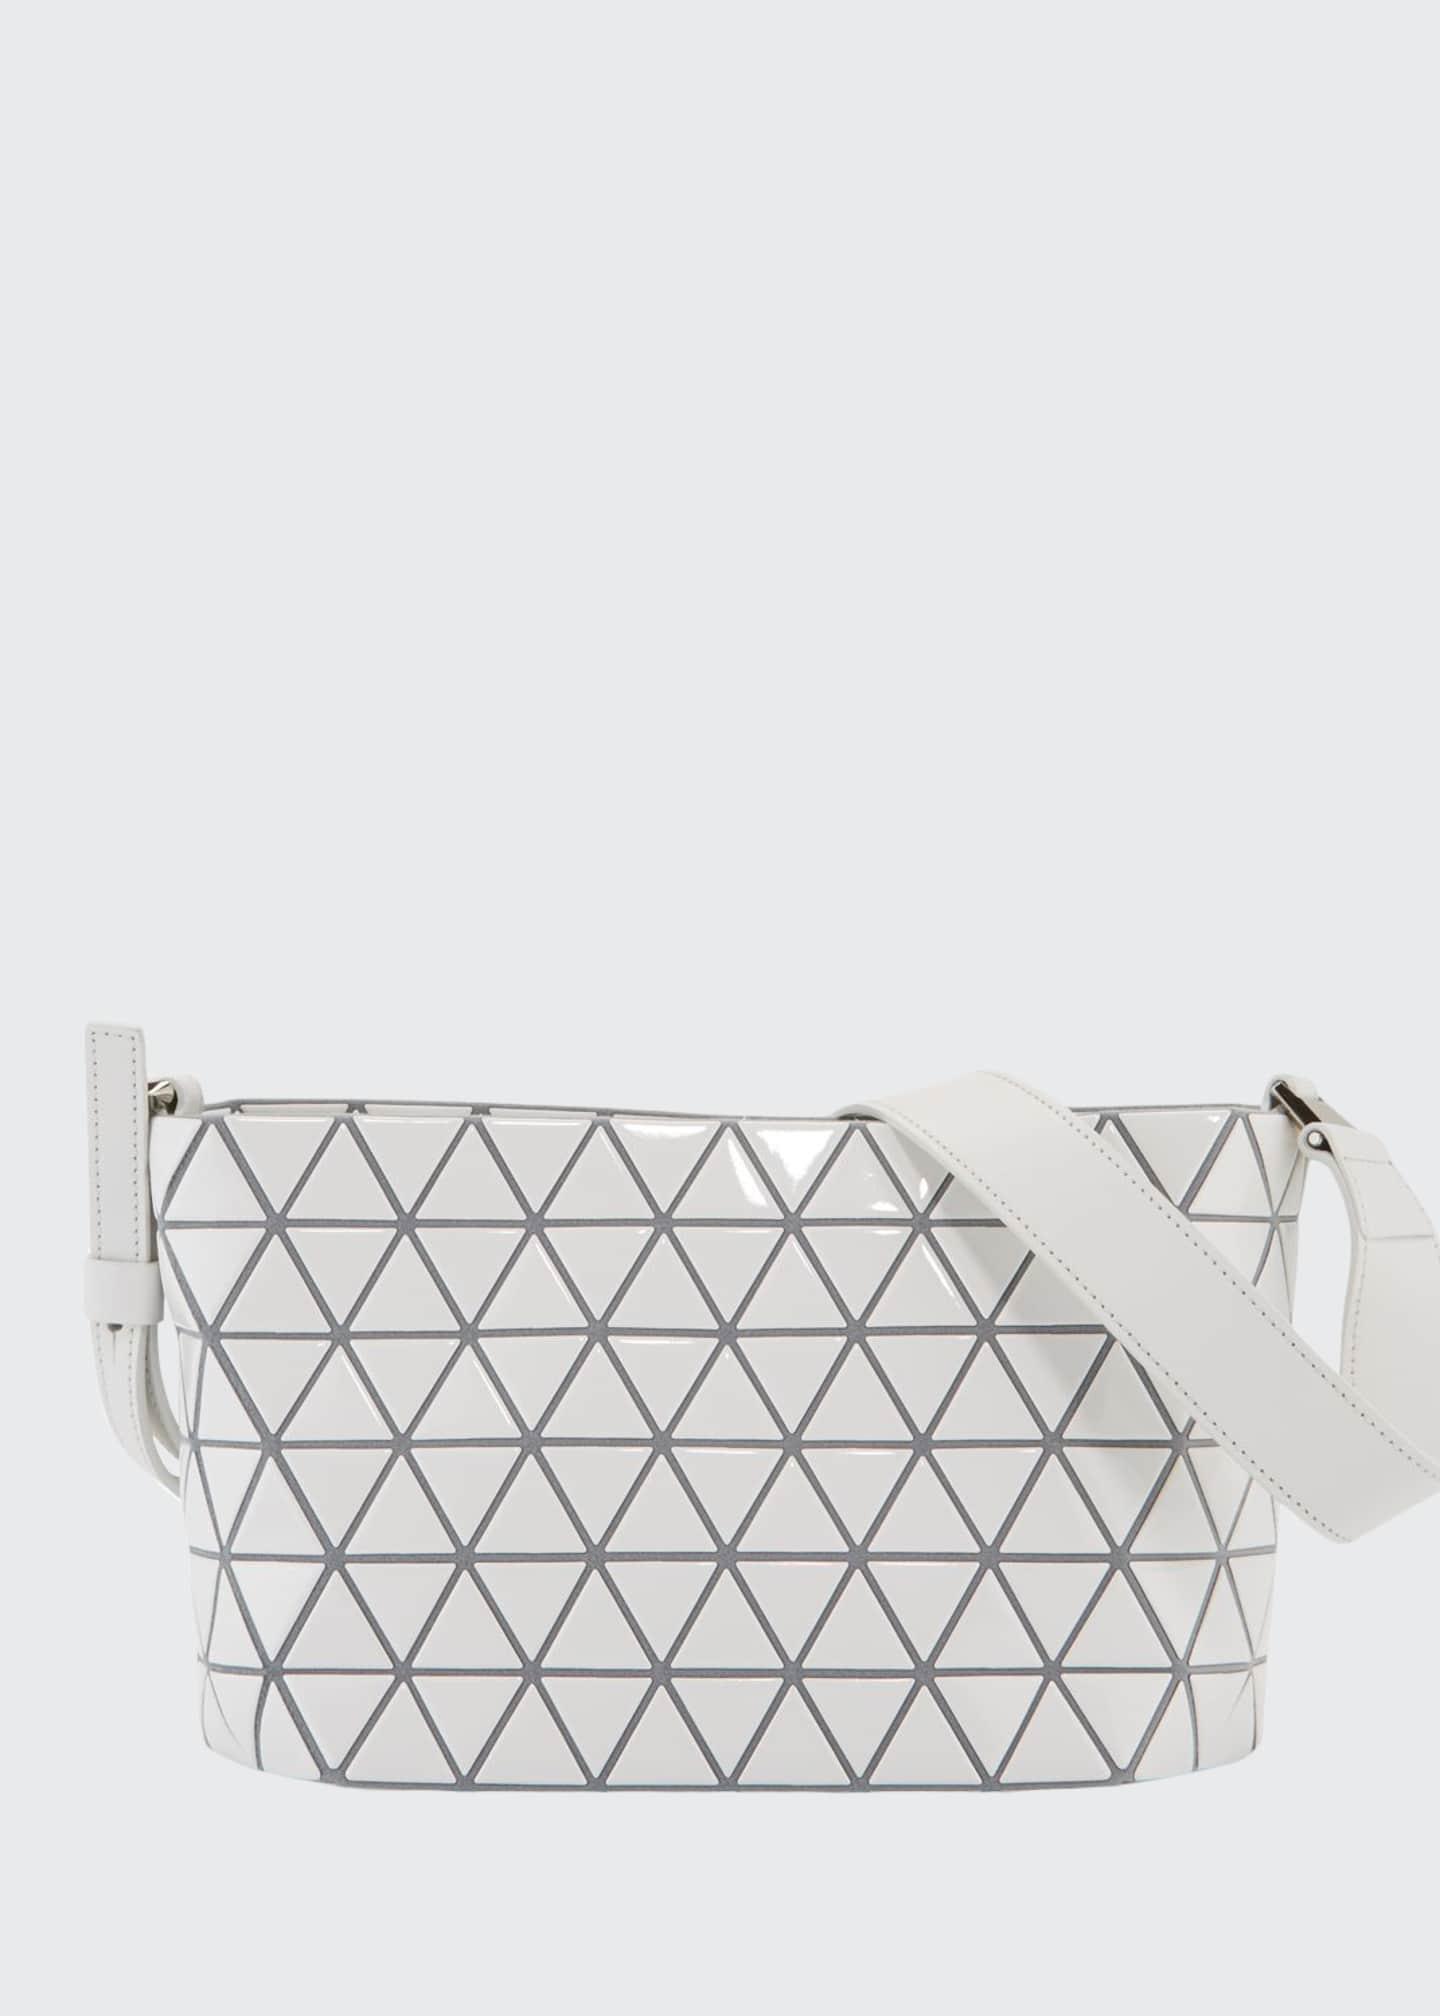 BAO BAO ISSEY MIYAKE Crystal Gloss Crossbody Bag